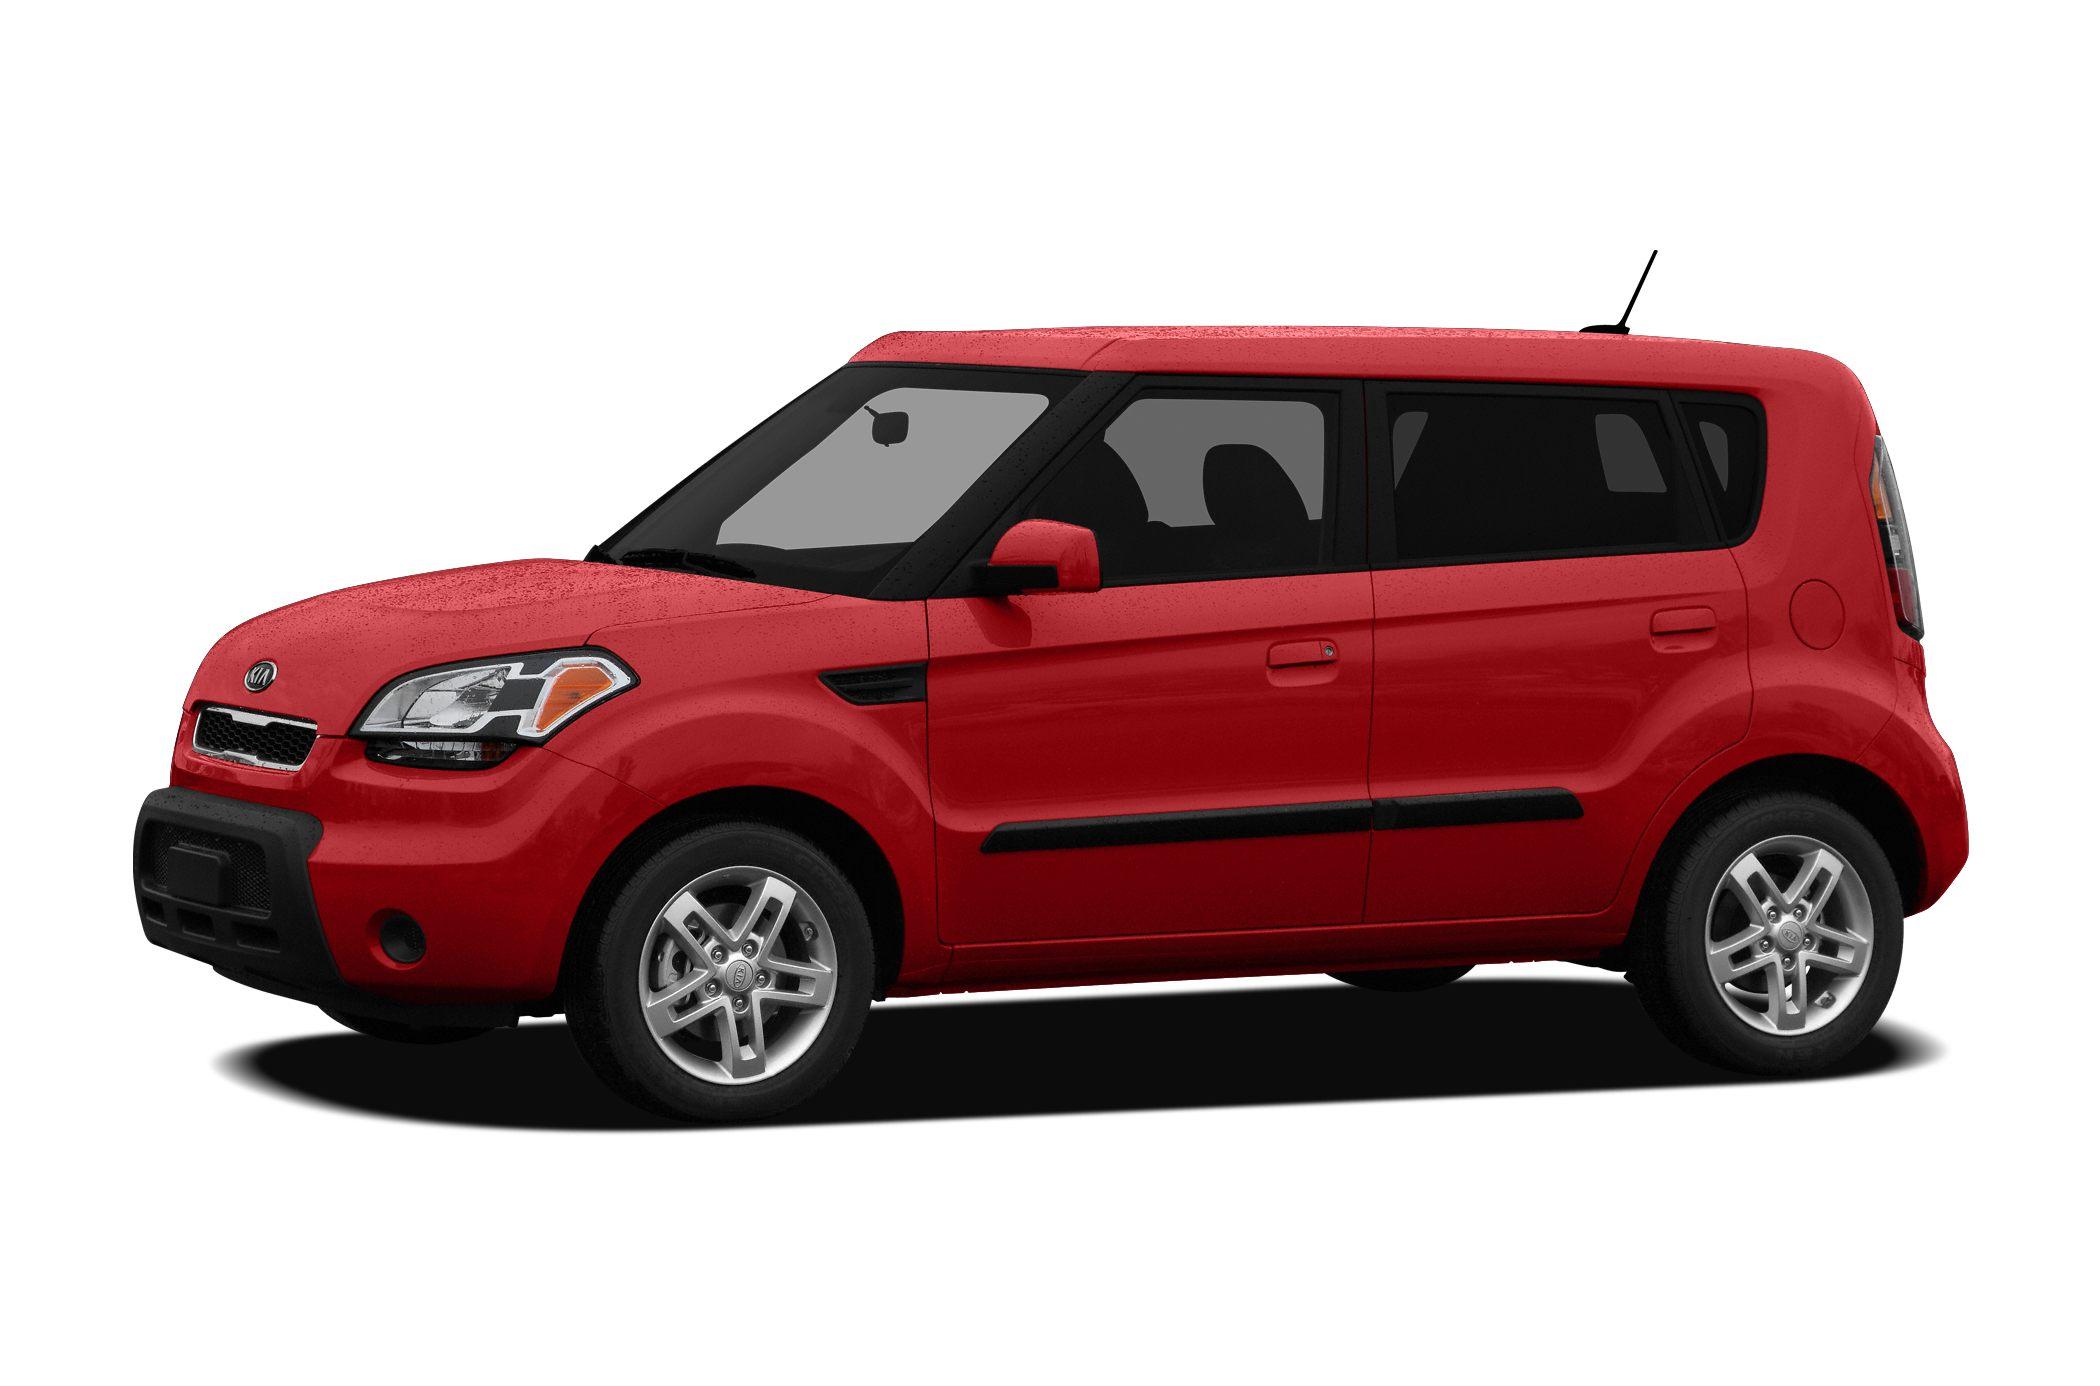 2011 kia soul specs and prices rh autoblog com kia soul 2012 owners manual 2015 Kia Soul Manual